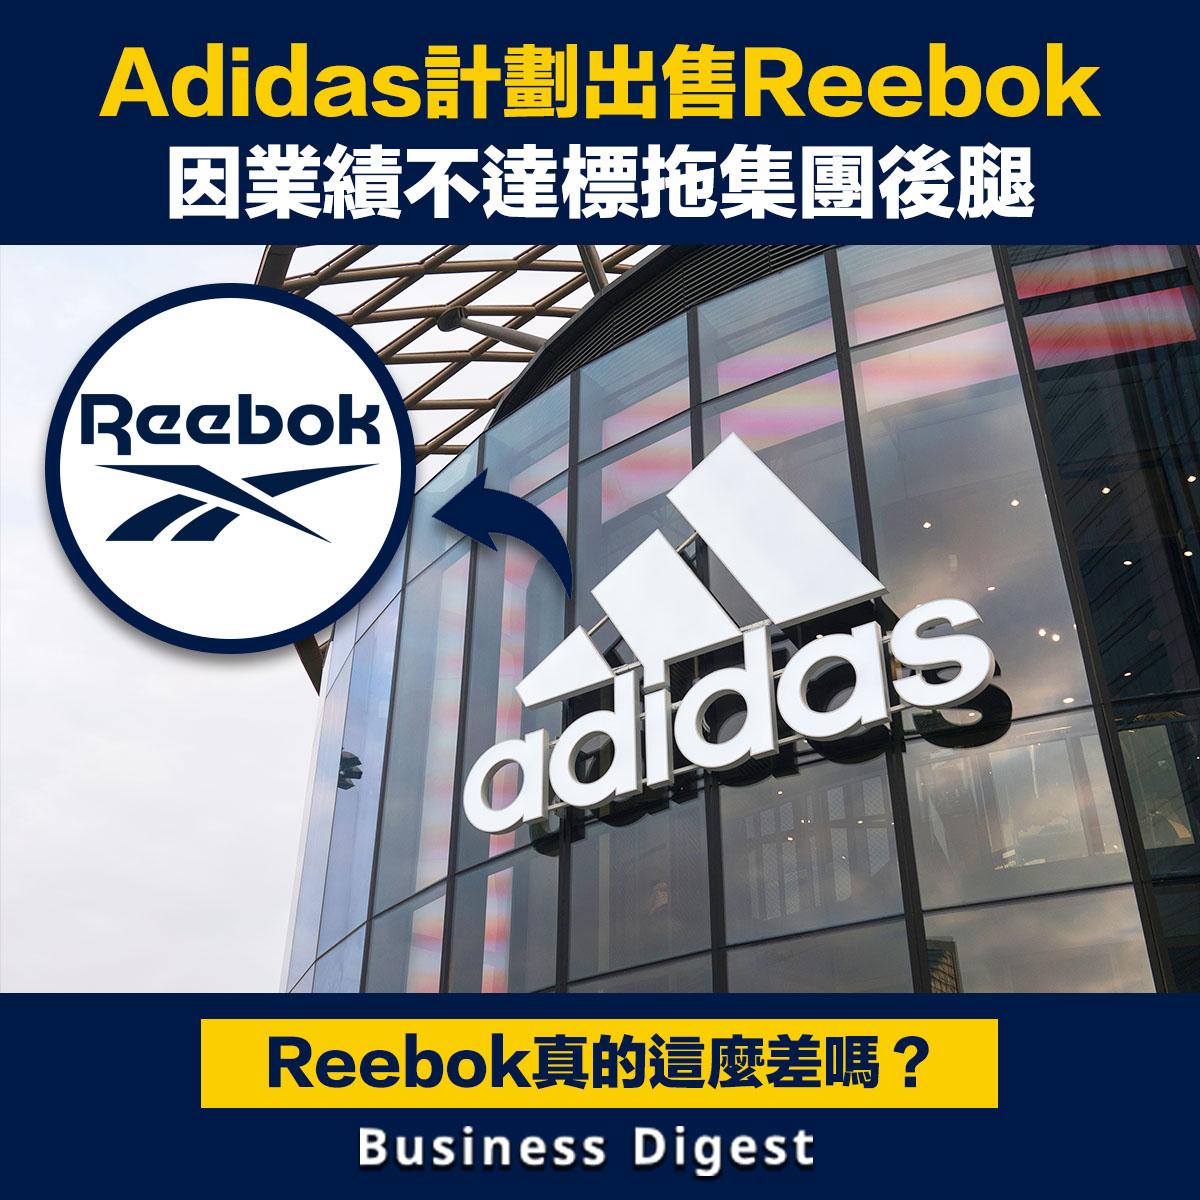 Adidas計劃出售Reebok,因業績不達標拖集團後腿